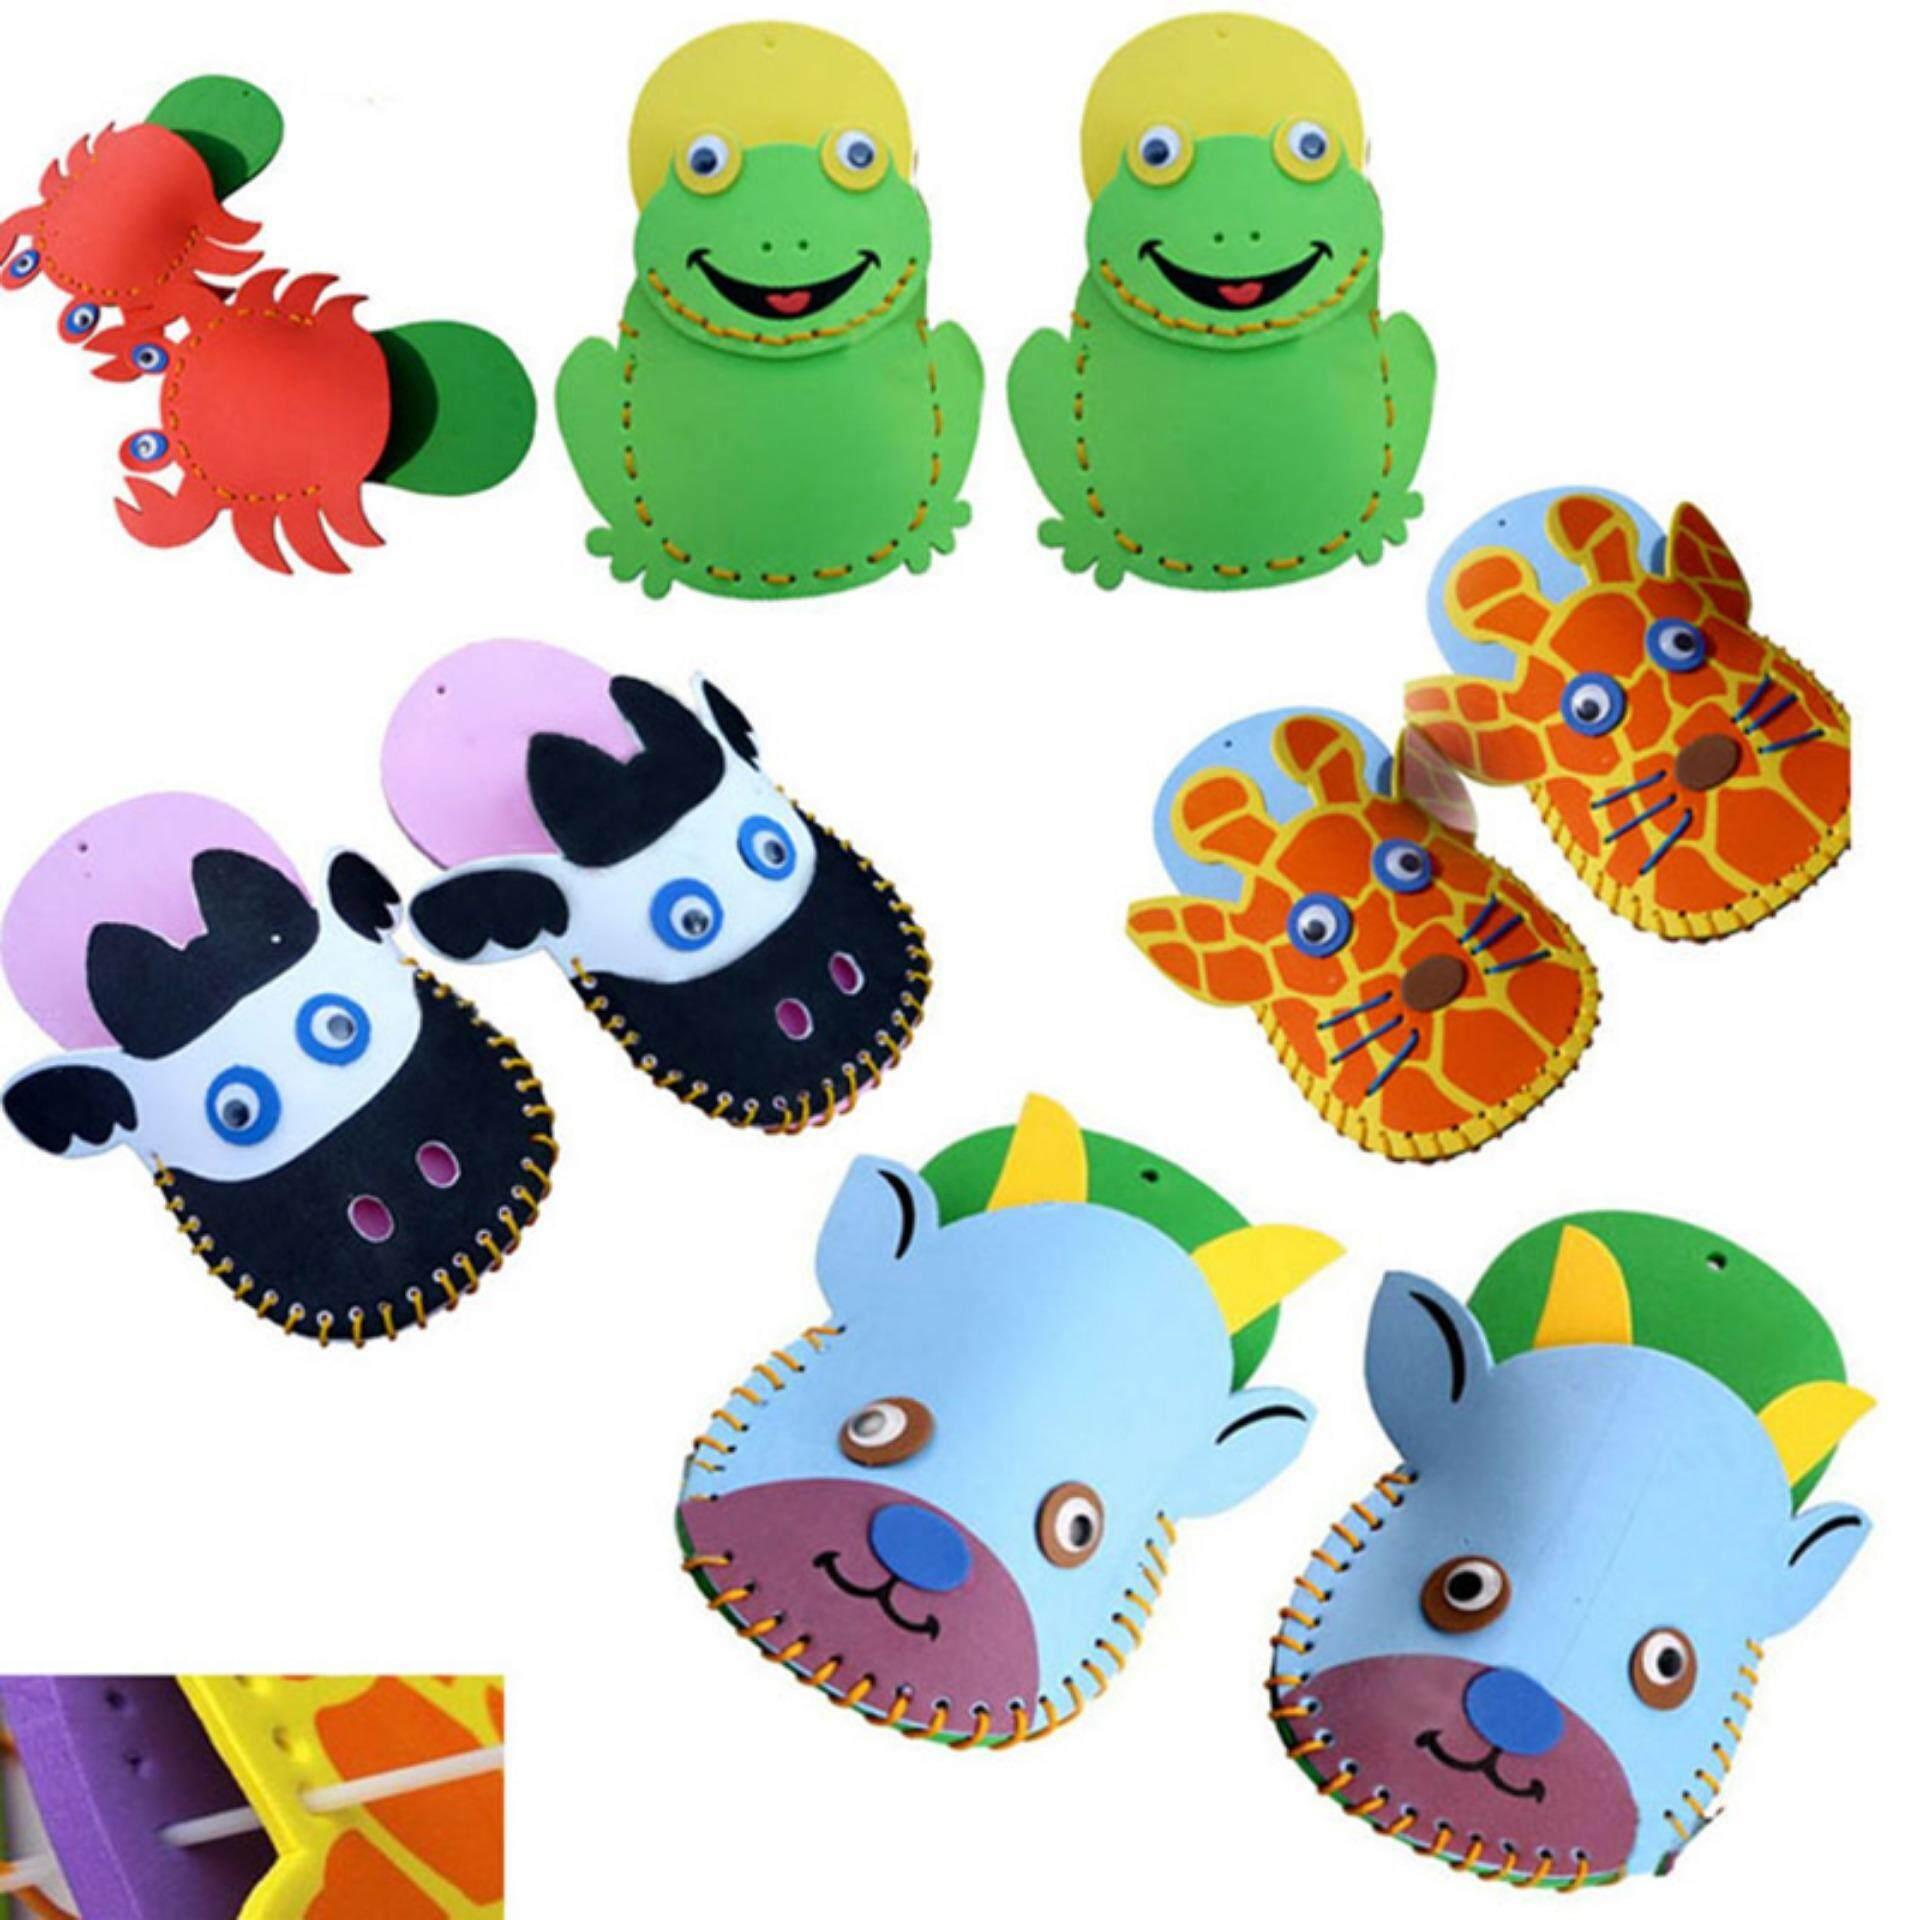 Buy Sell Cheapest Diy Handmade 1 Best Quality Product Deals Busa Eva 50cm Pair Sandal Anak Kartun Hewan Buatan Tangan